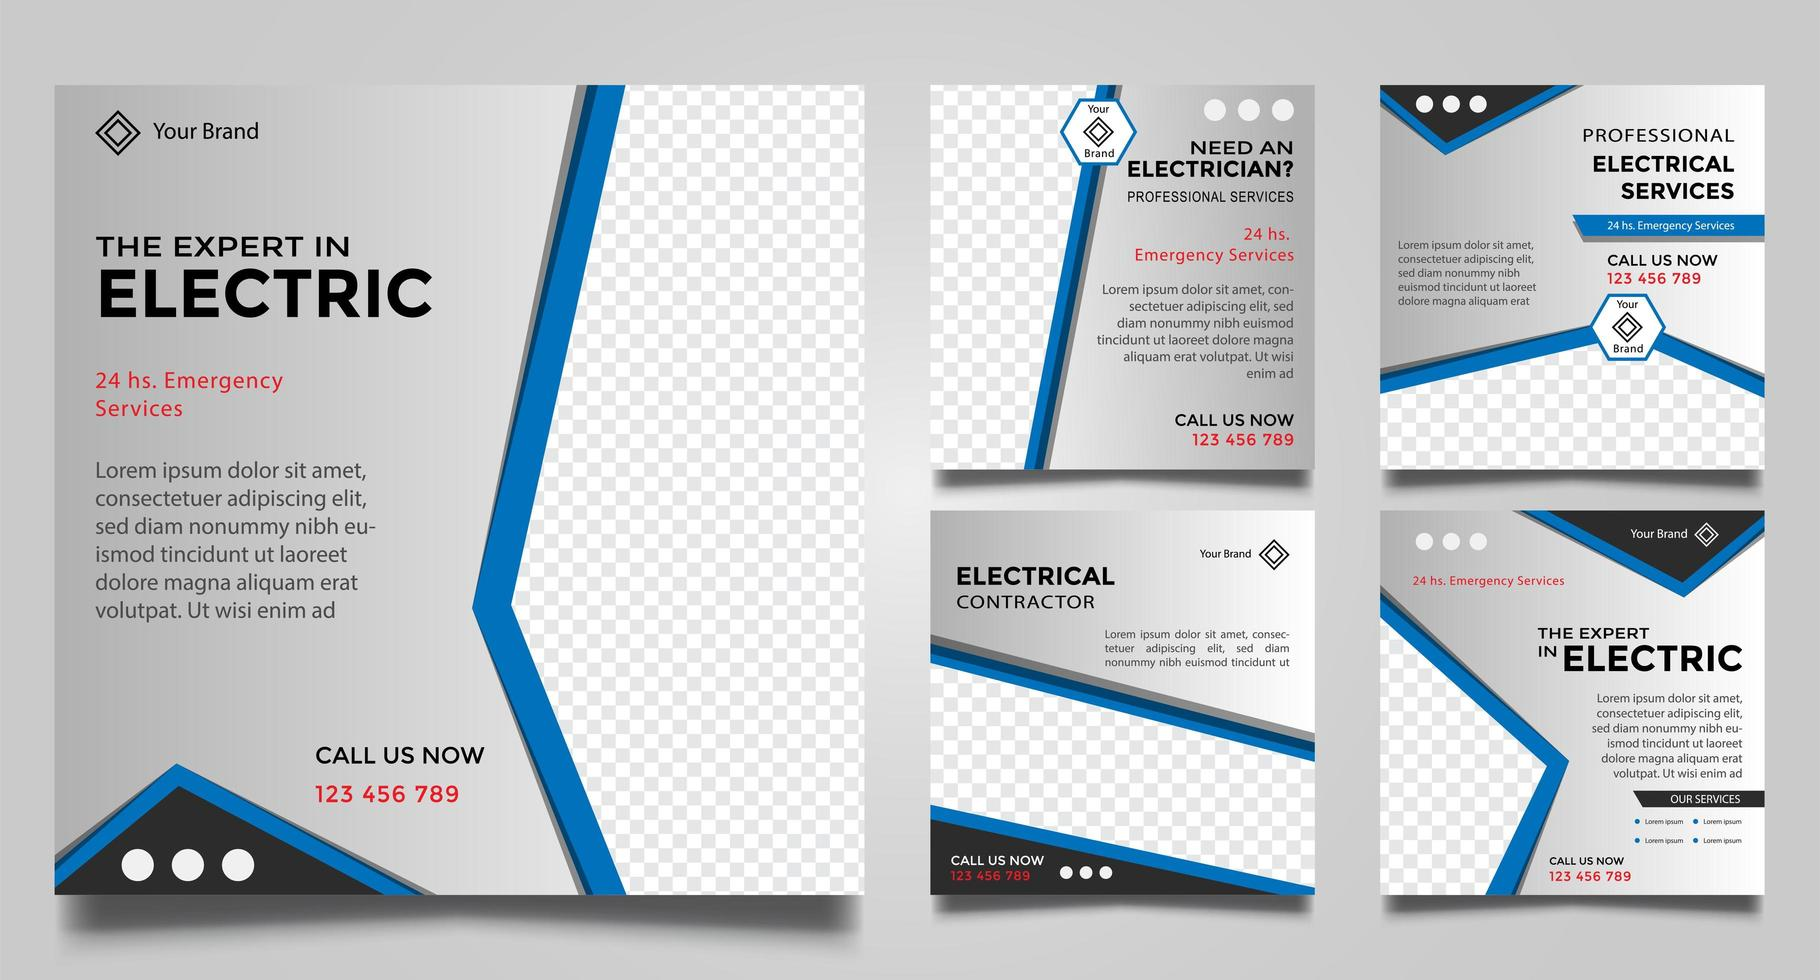 elektrische Service Social Media Post-Vorlagen. vektor